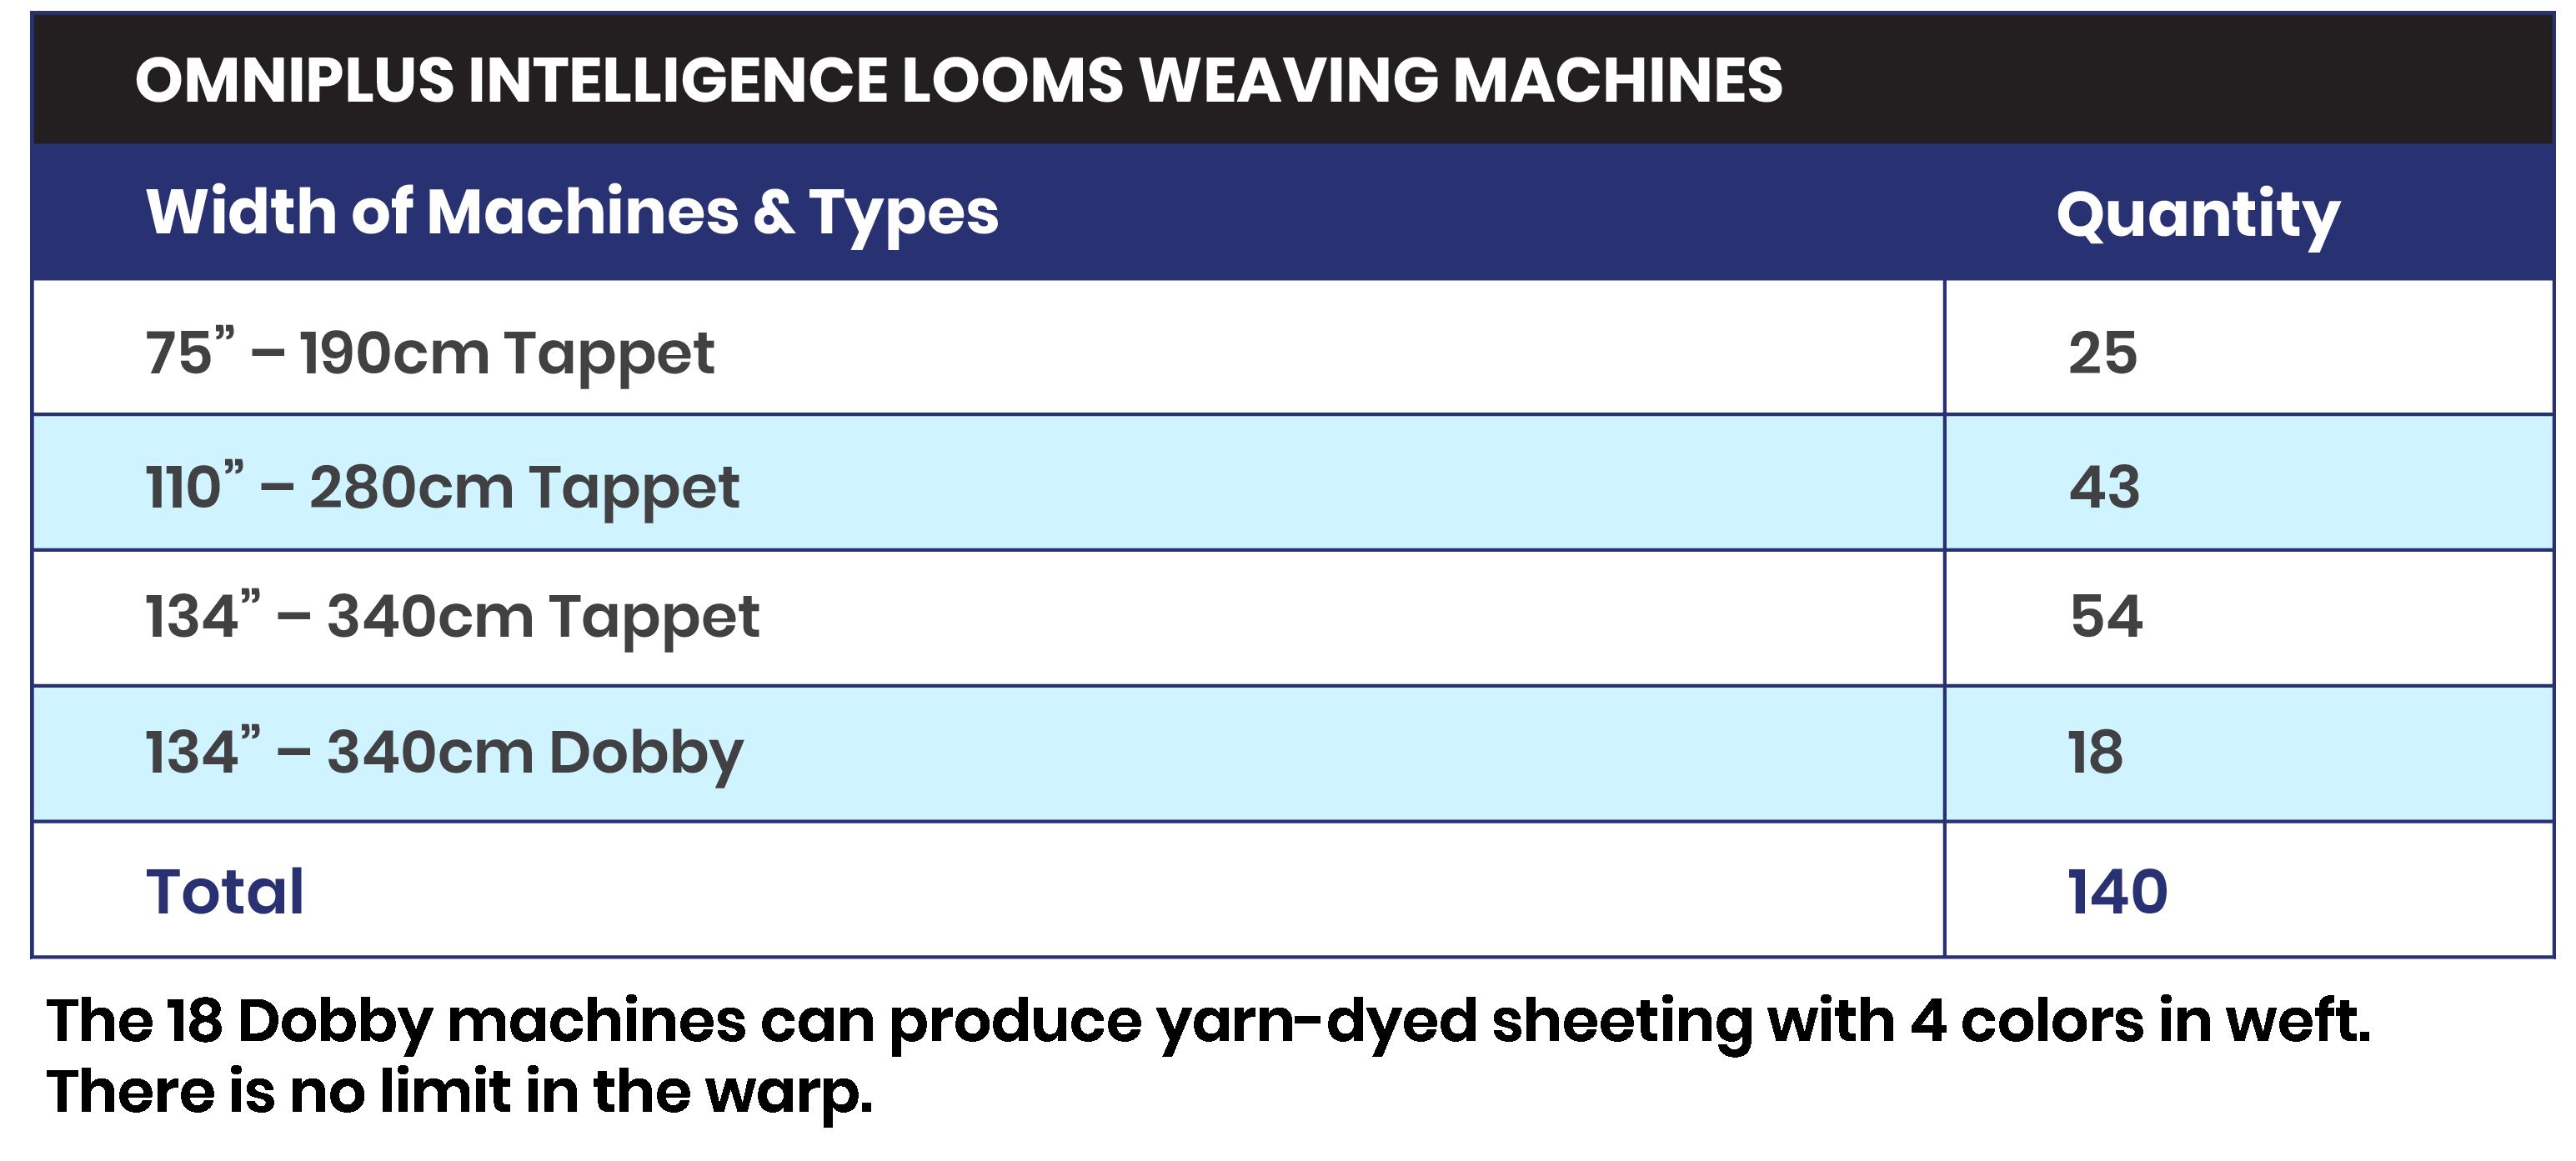 weaving-unit-strength-06